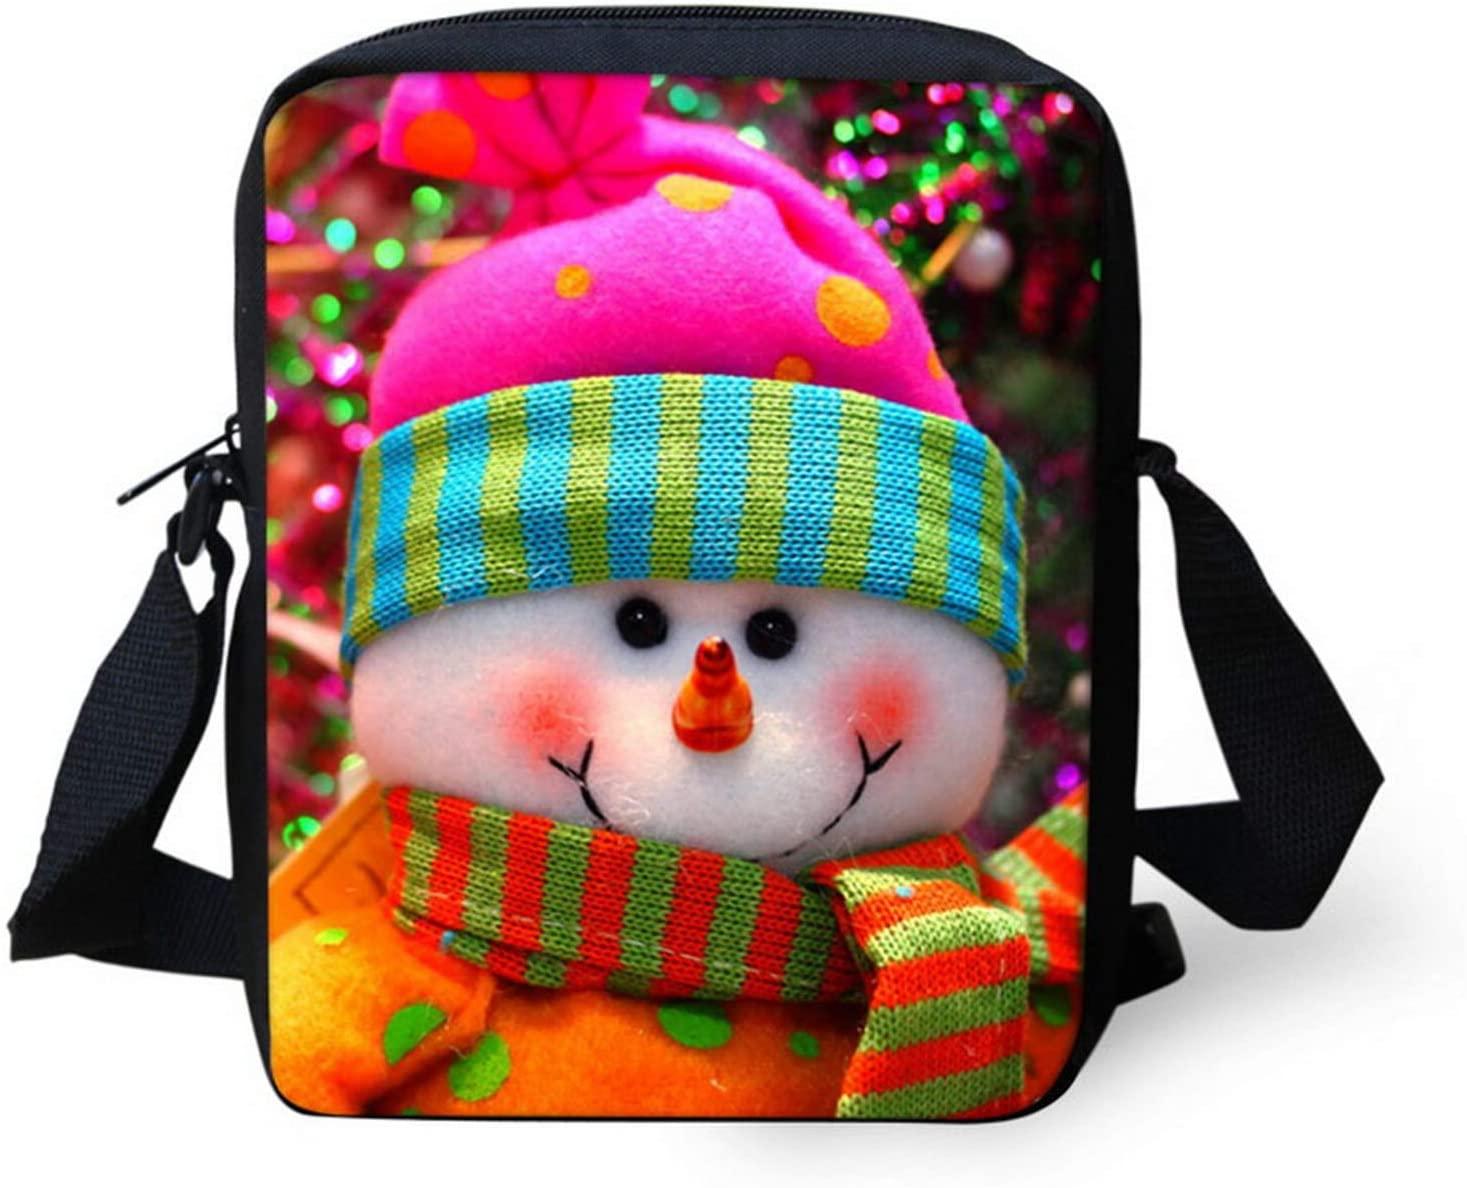 NETILGEN Small Messenger Bag, Cute Snowman Cross Body Bag with Adjustable Strap, Kids Travel Shoulder Bag with Zipper, Boys Girls Messenger Bag Strap, Durable Polyester